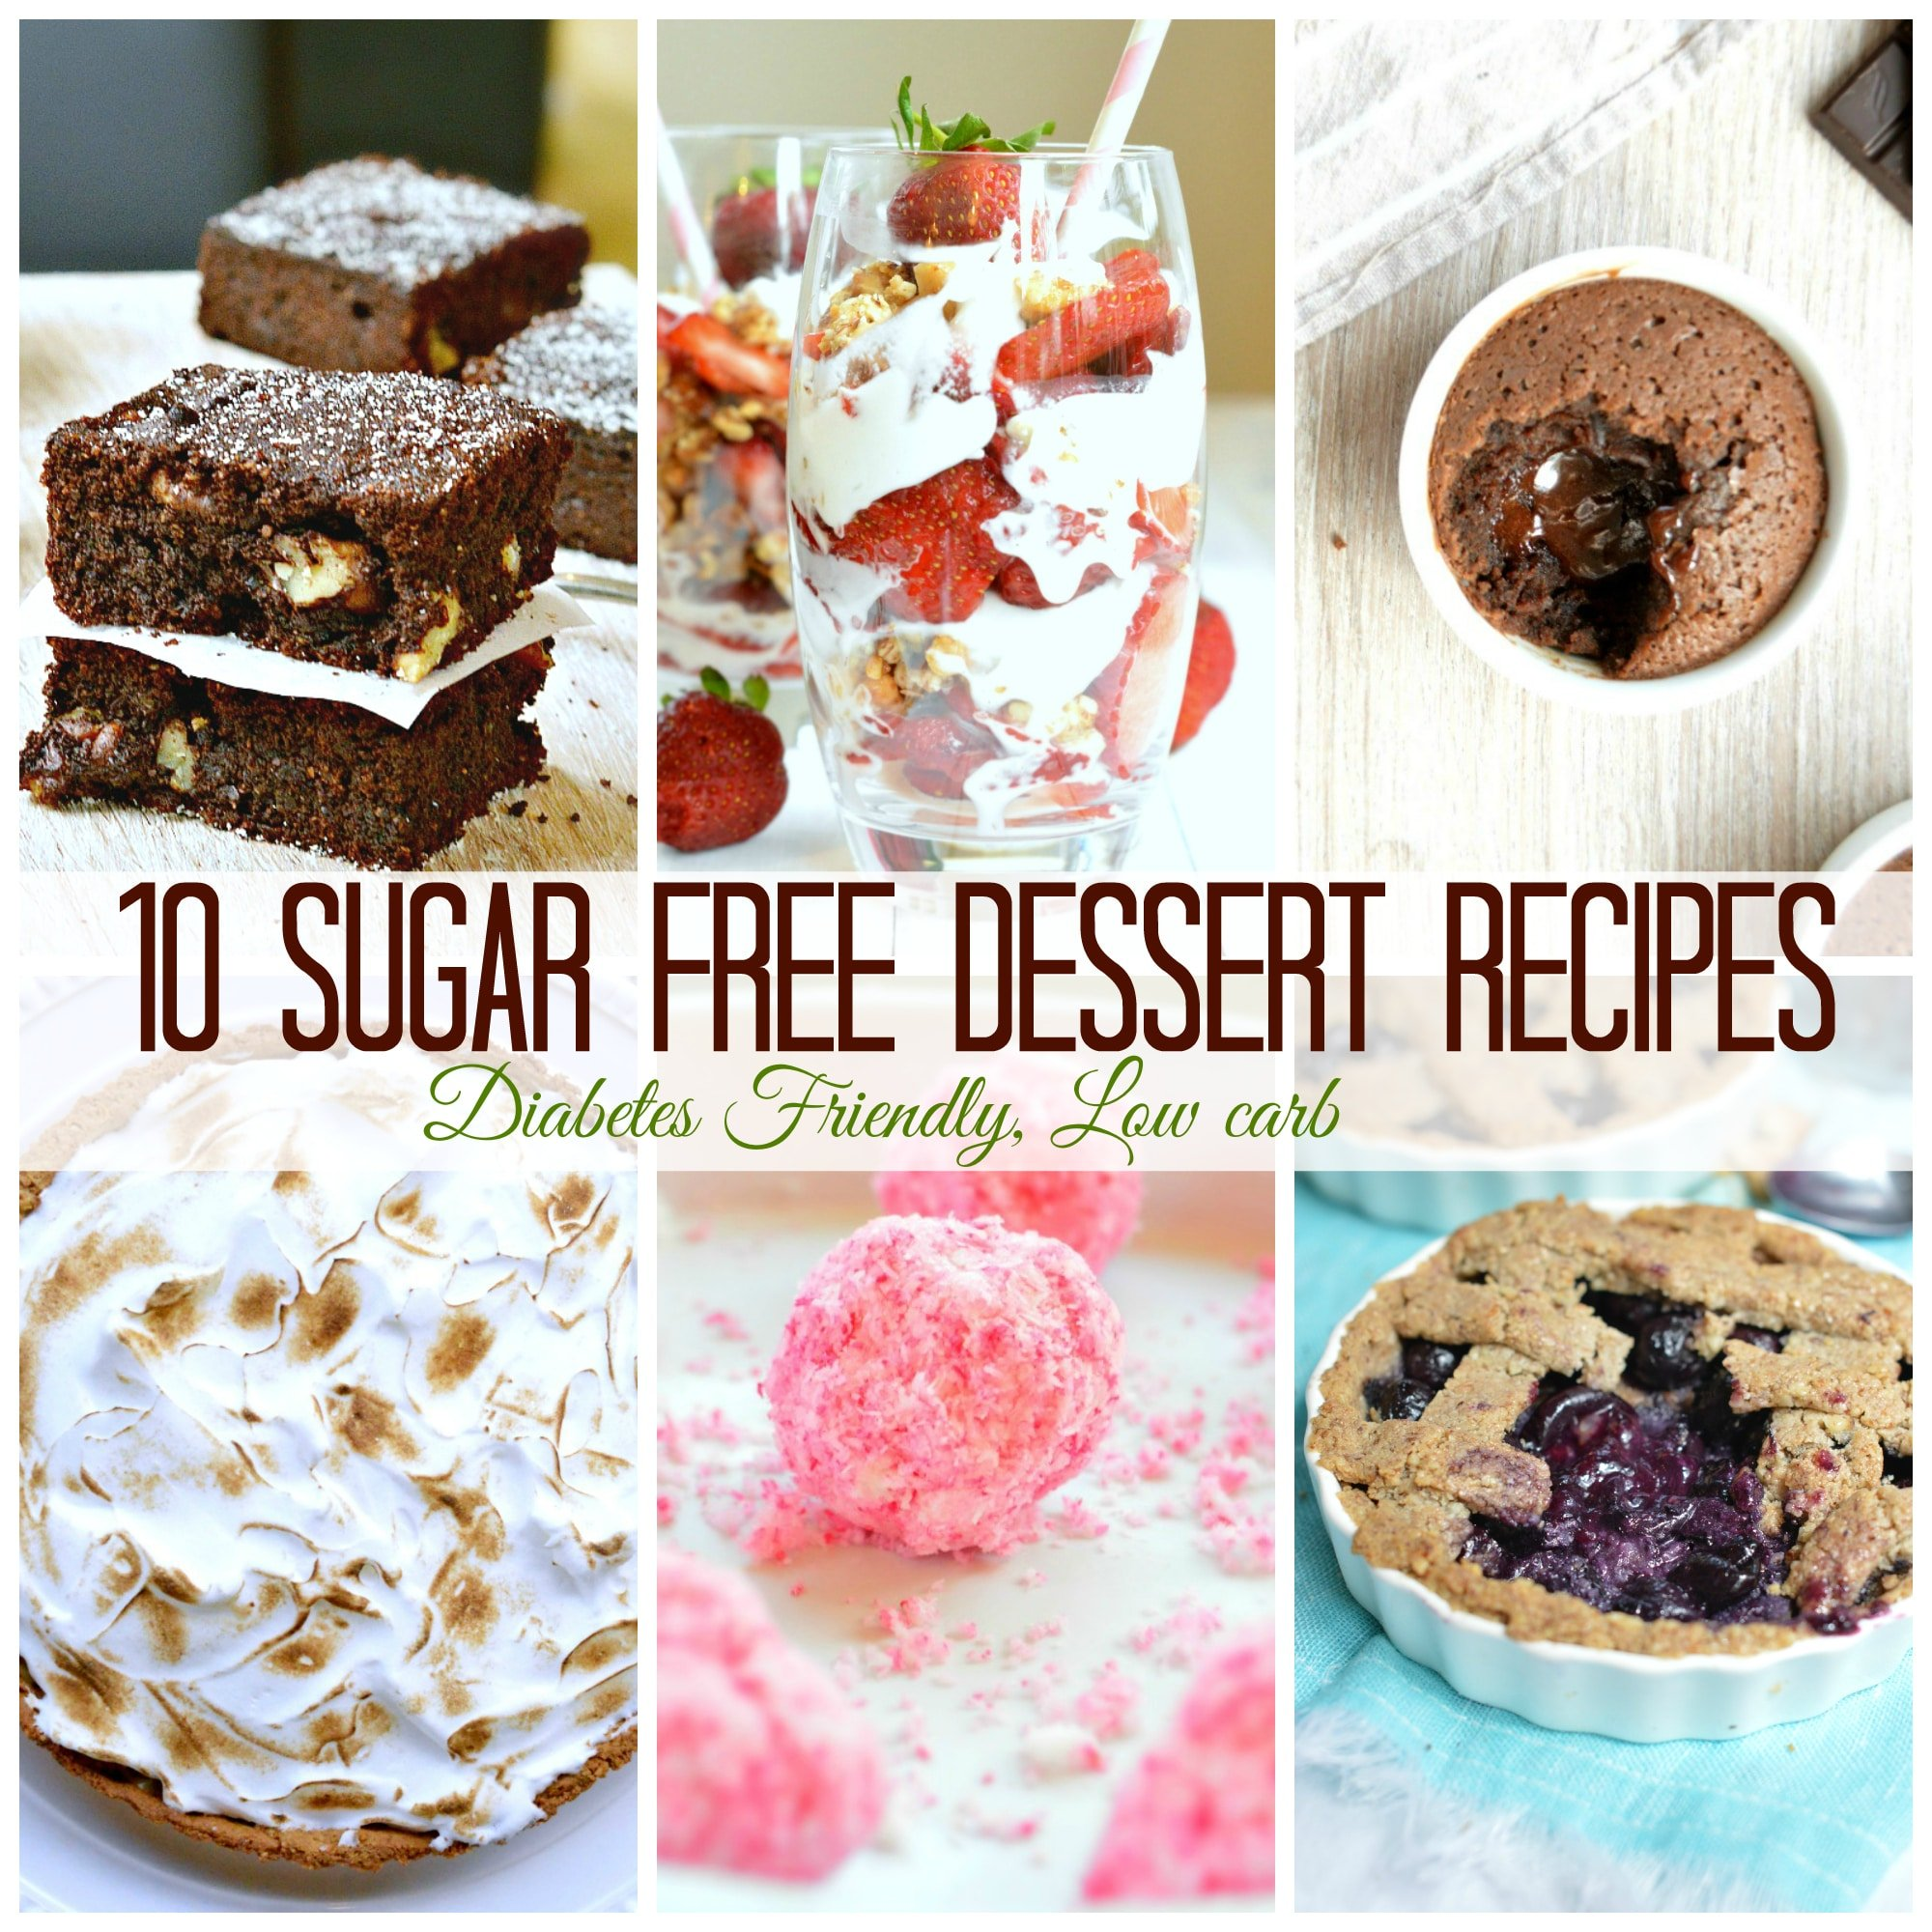 10 Sugar Free Dessert For Diabetics